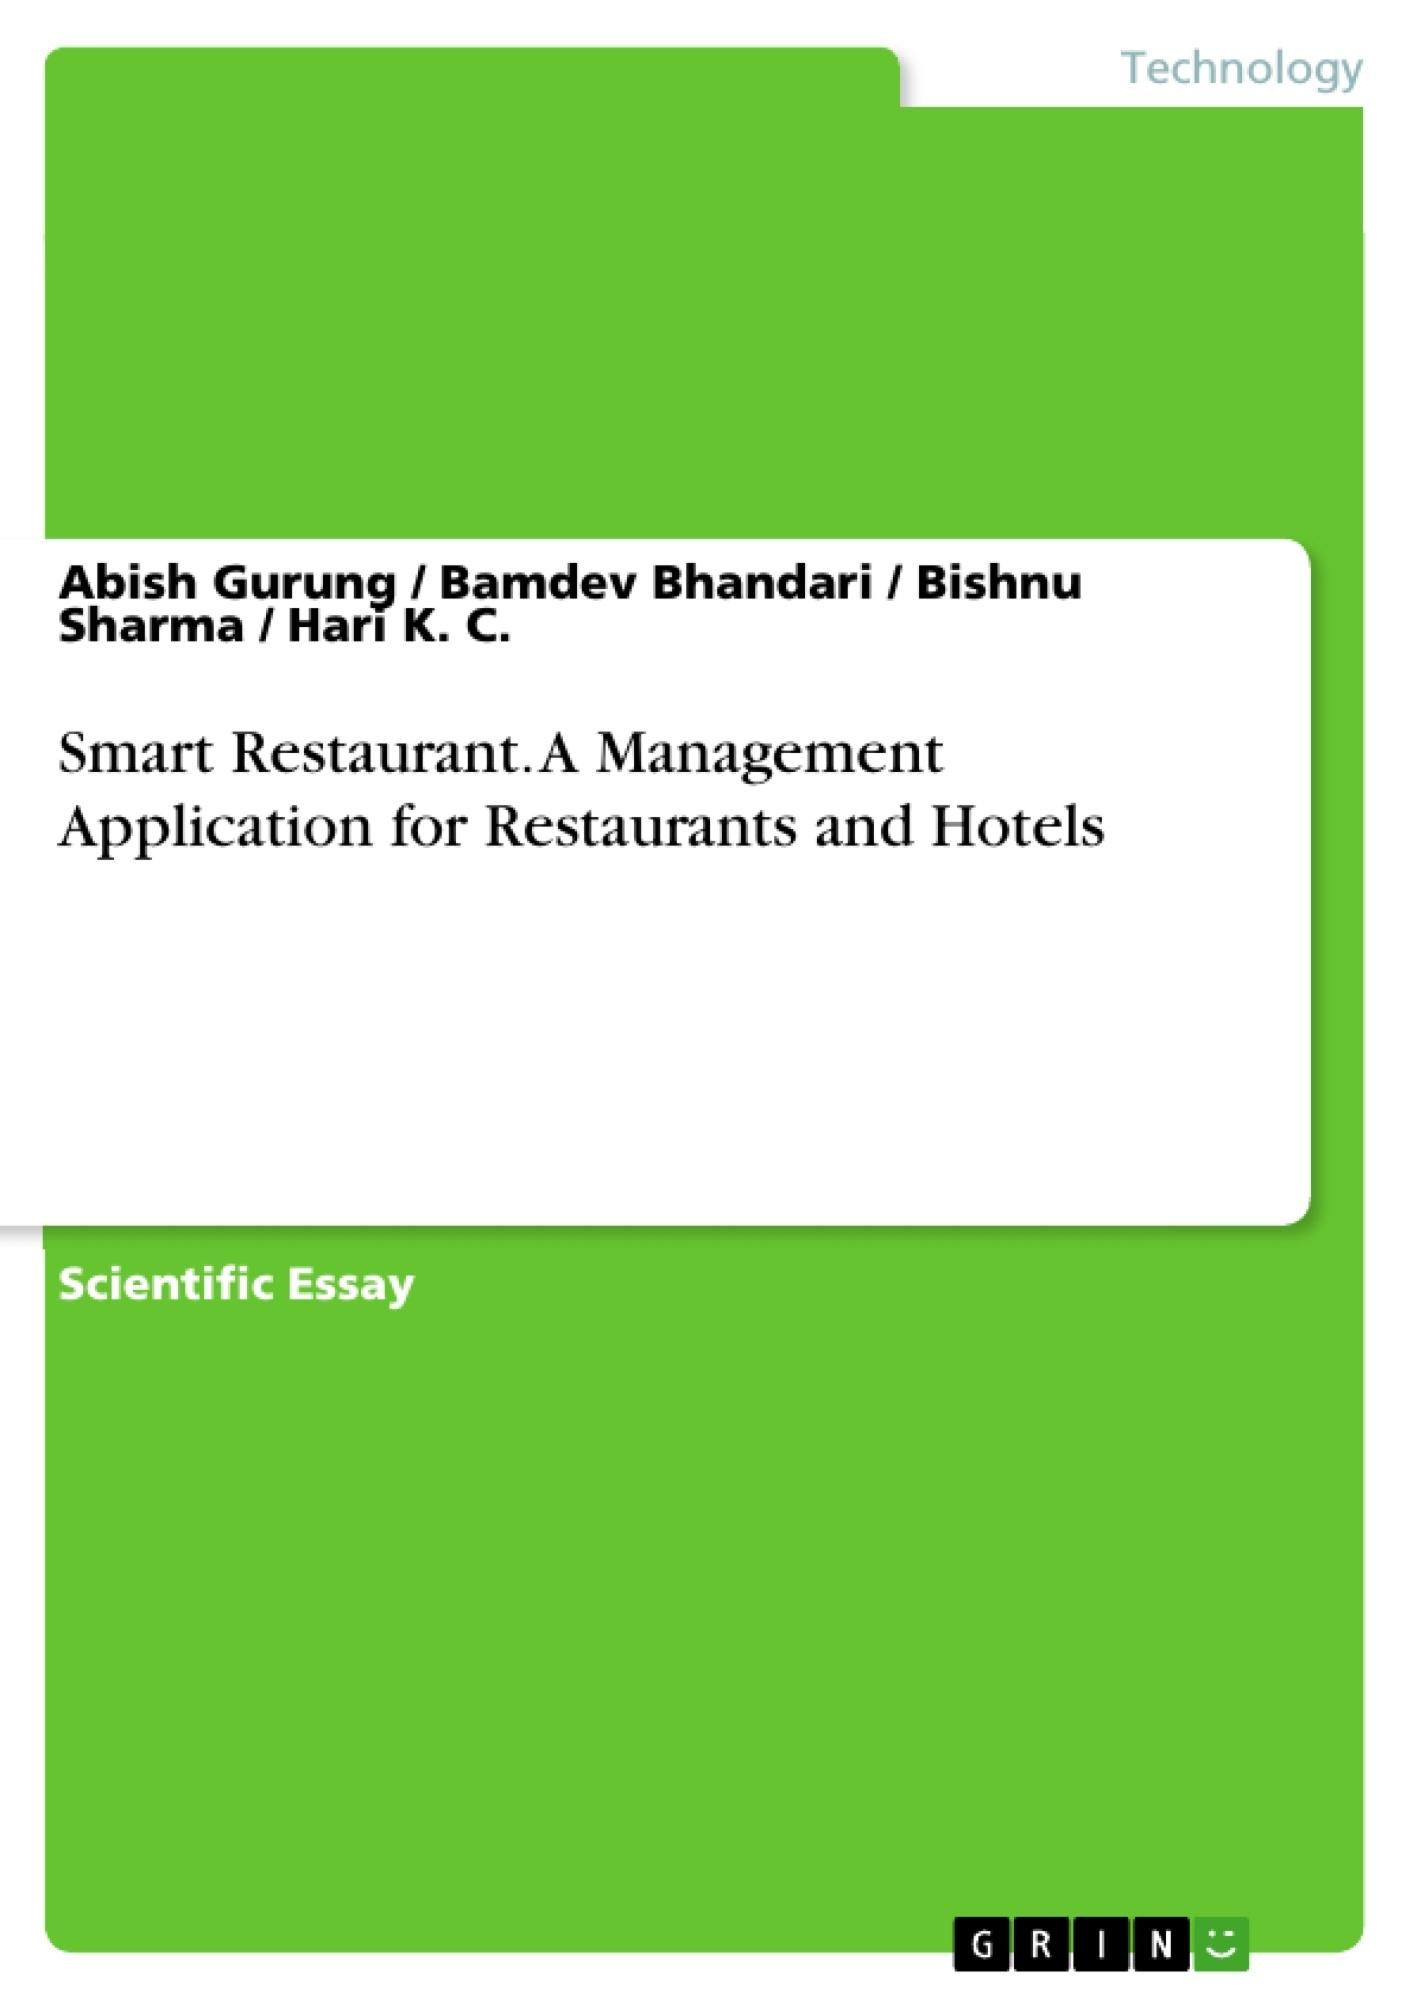 GRIN - Smart Restaurant  A Management Application for Restaurants and Hotels